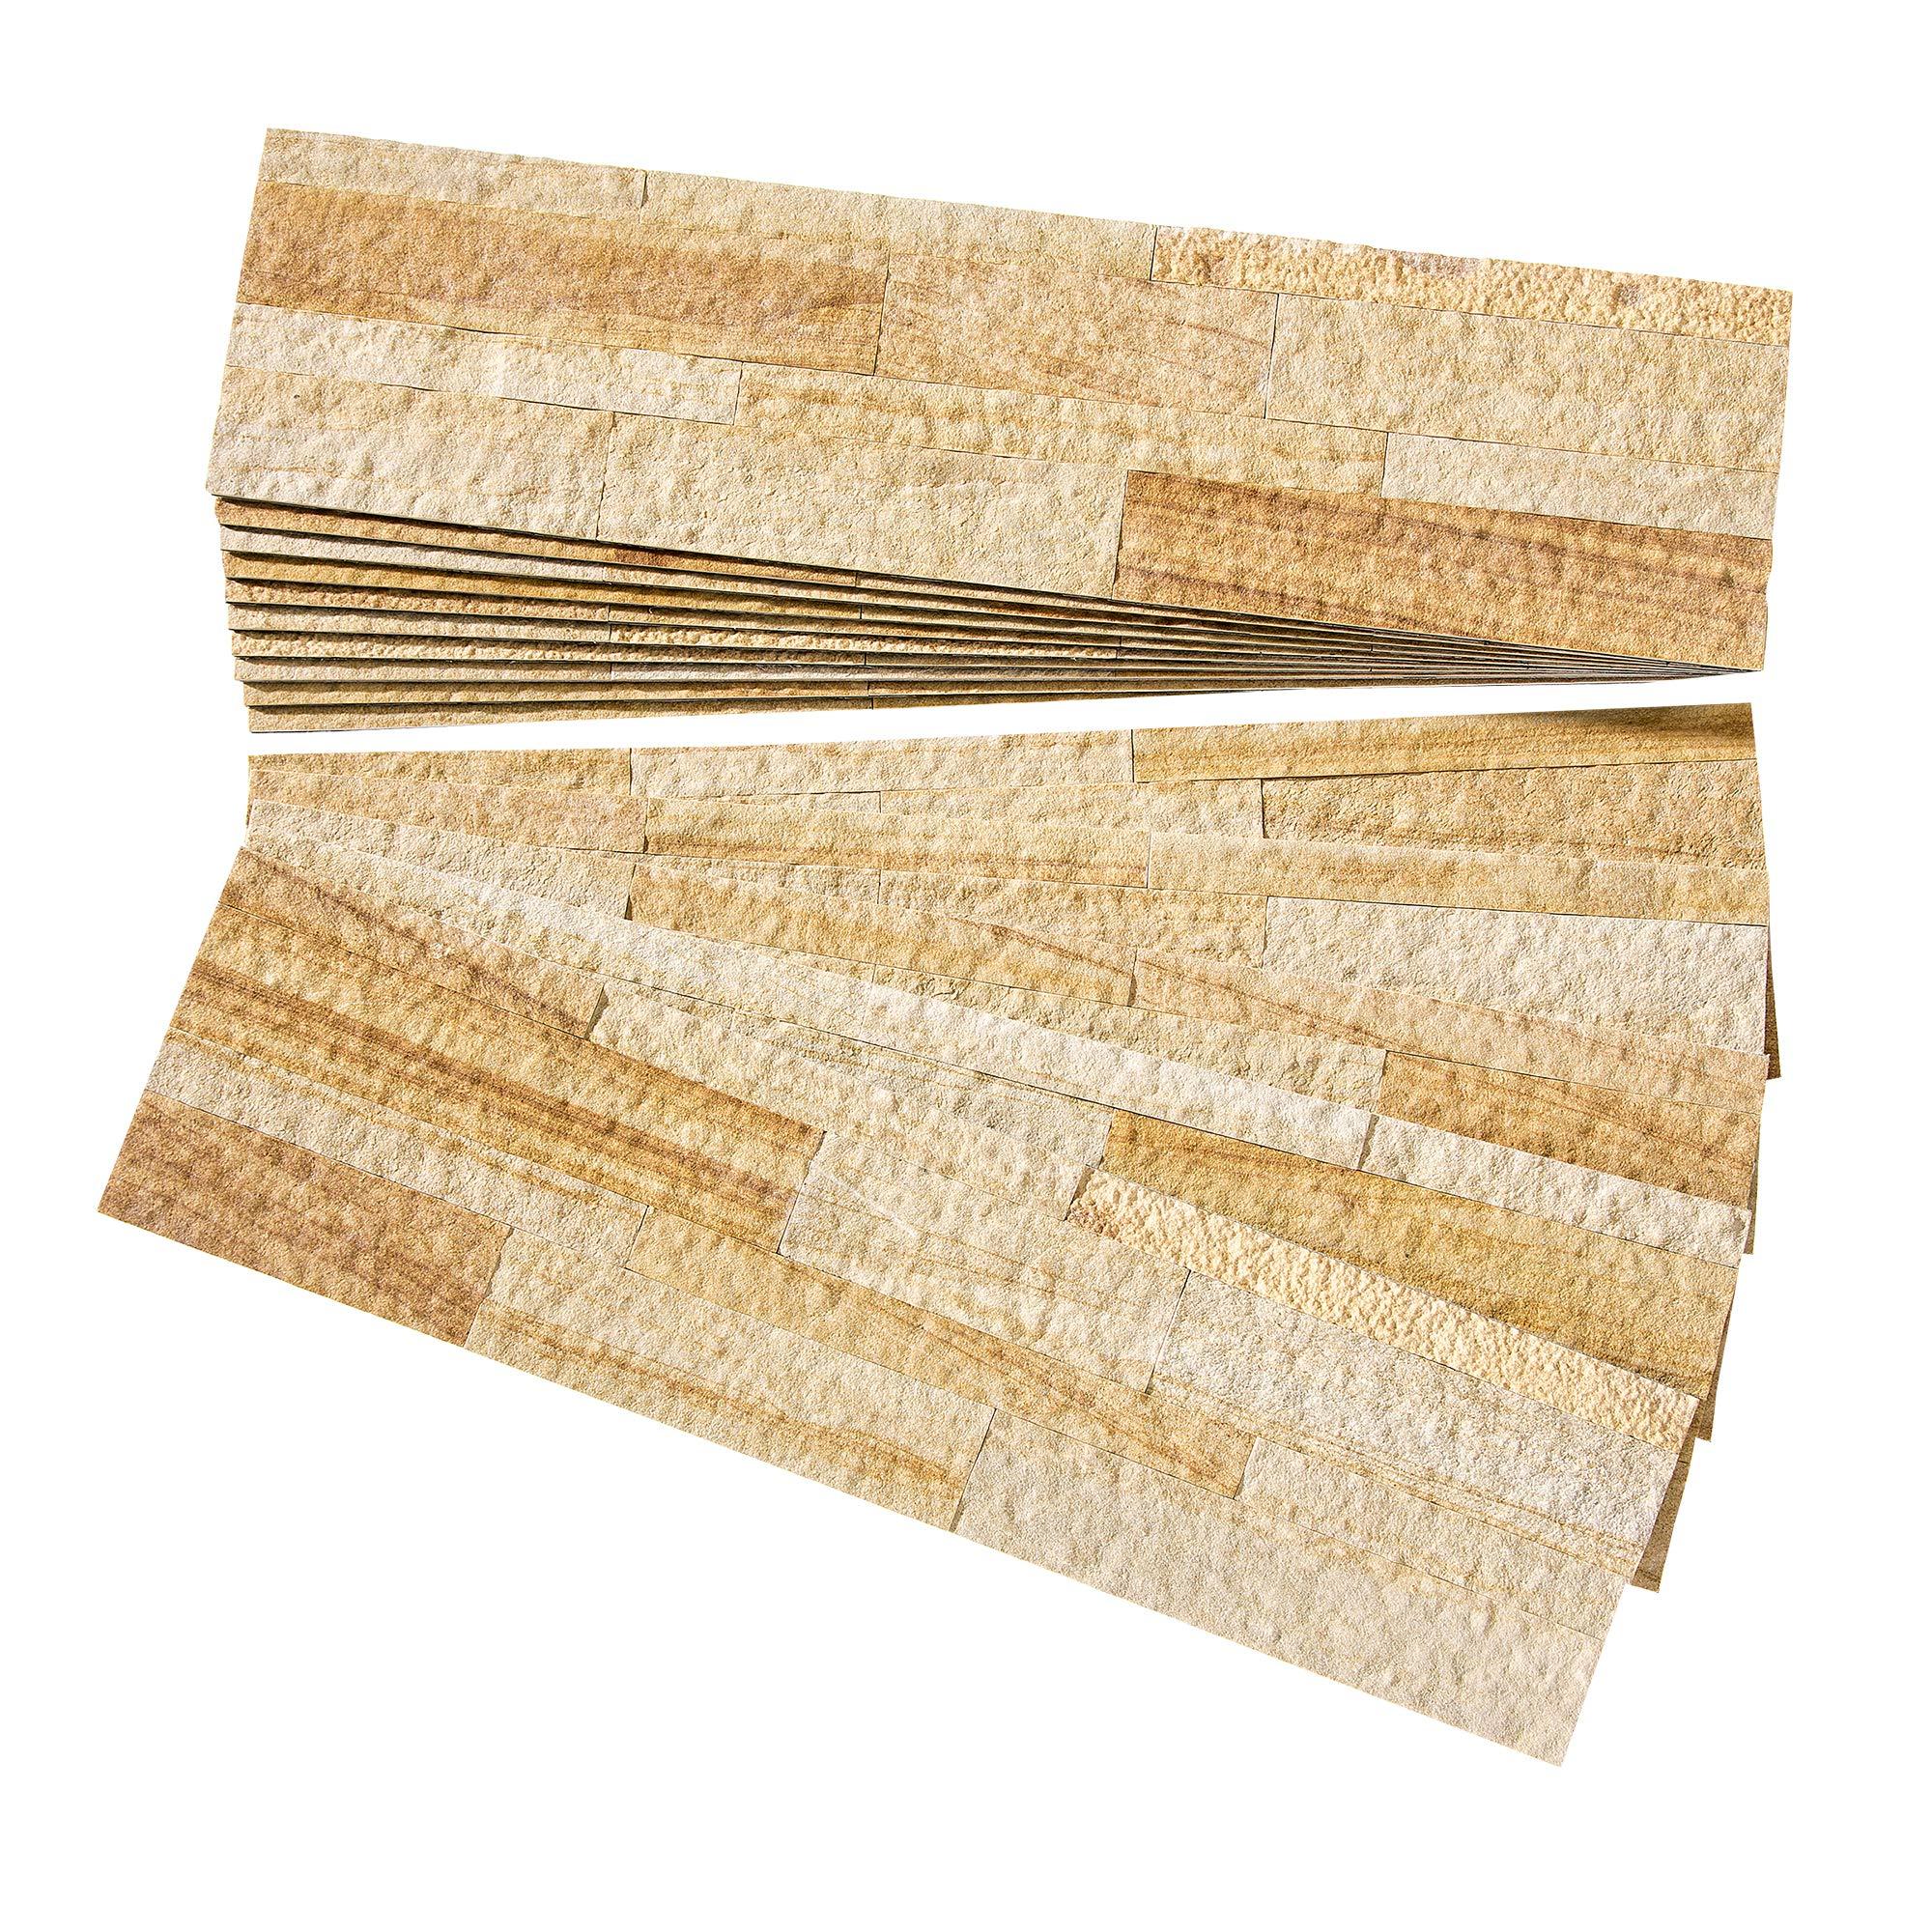 Aspect Peel and Stick Stone Overlay Kitchen Backsplash - Golden Sandstone (Approx. 15 sq ft Kit) - Easy DIY Tile Backsplash